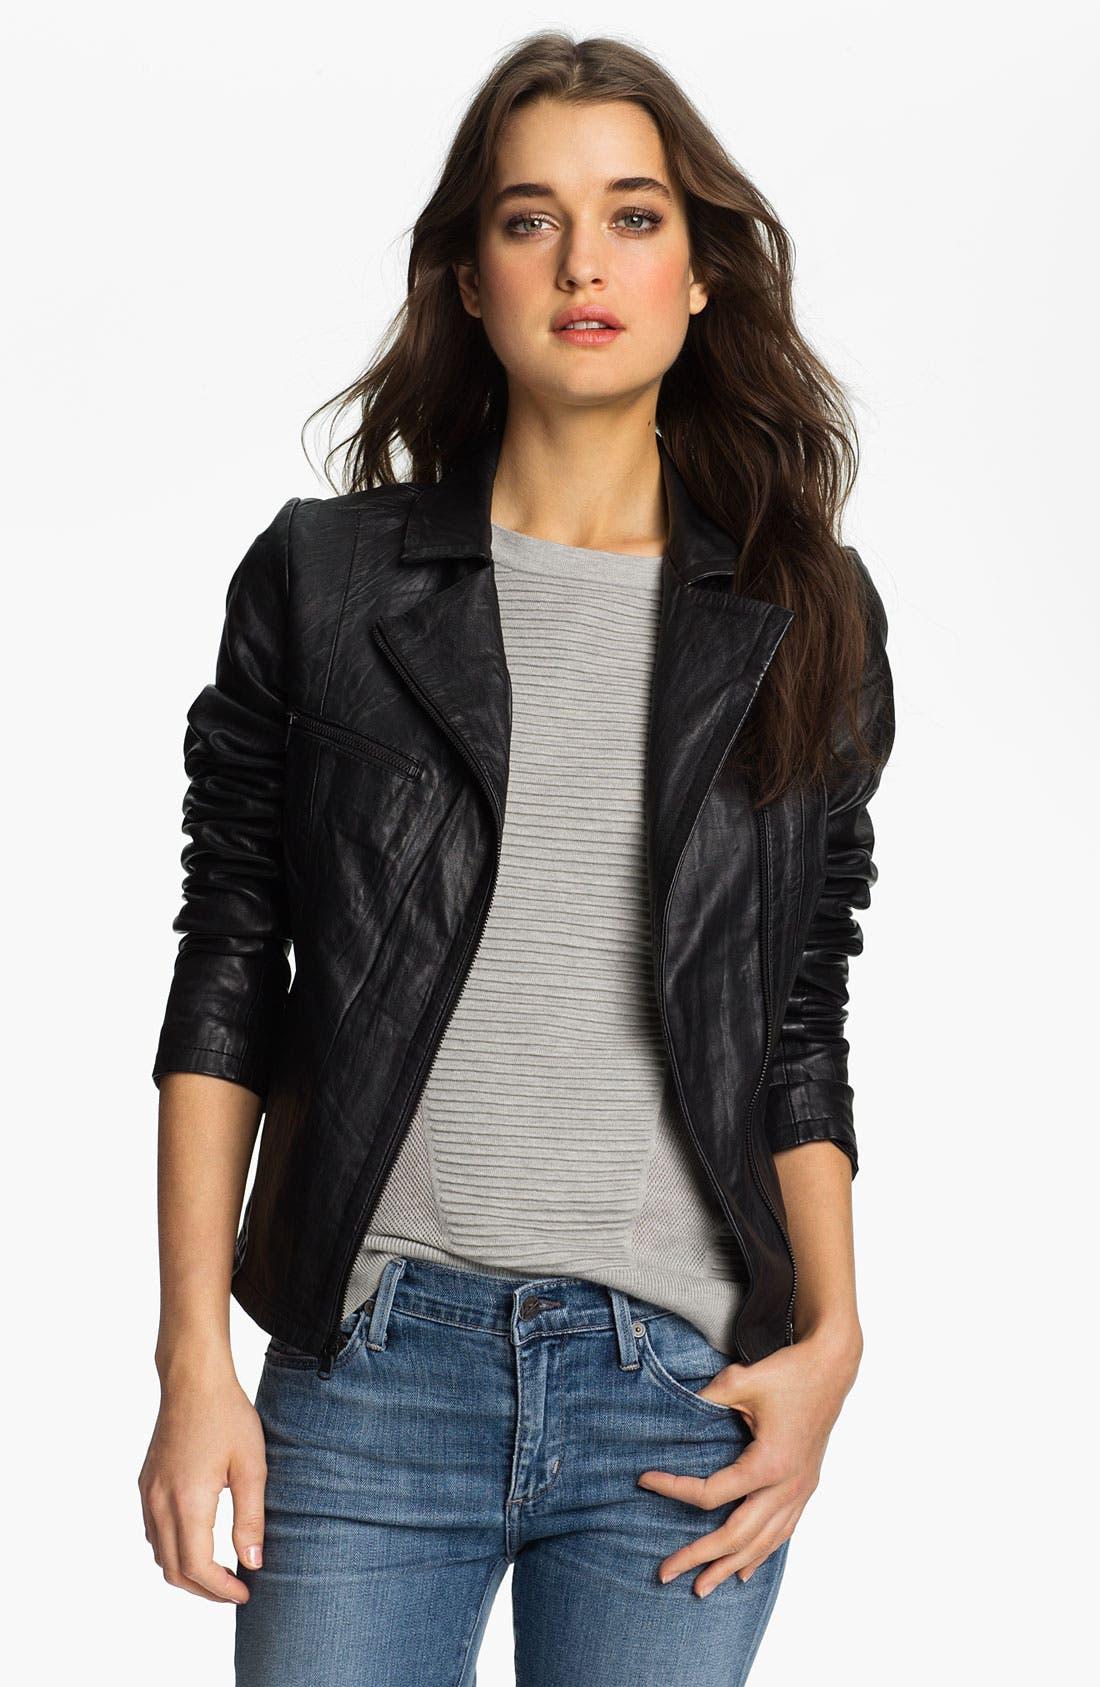 Alternate Image 1 Selected - Paige Denim 'Ridley' Leather Biker Jacket